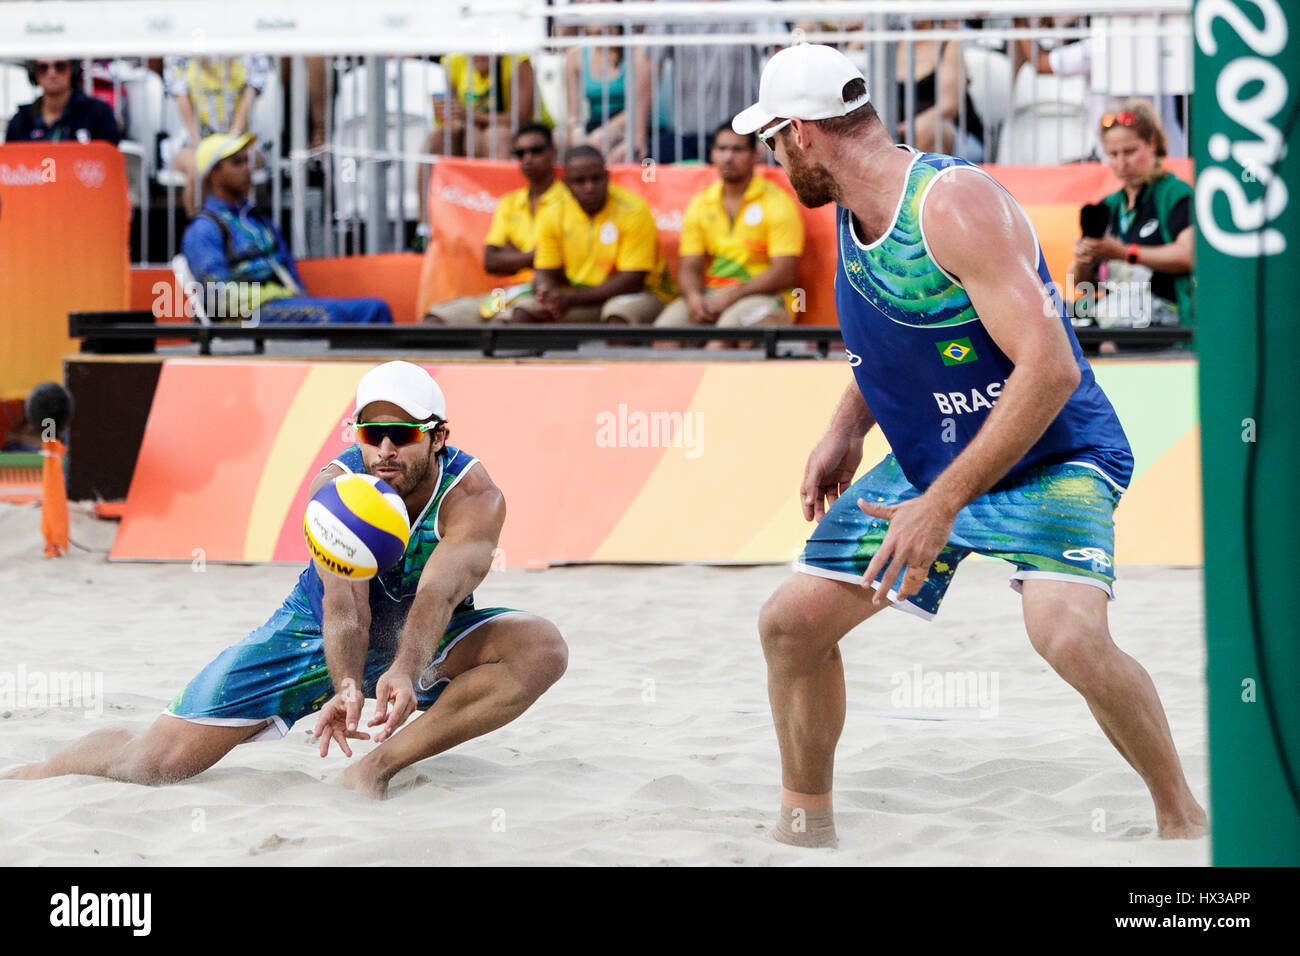 Río de Janeiro, Brasil. El 15 de agosto de 2016 Alison Cerutti - Bruno Schmidt (BRA) vs Phil Dalhausser - Nick Imagen De Stock